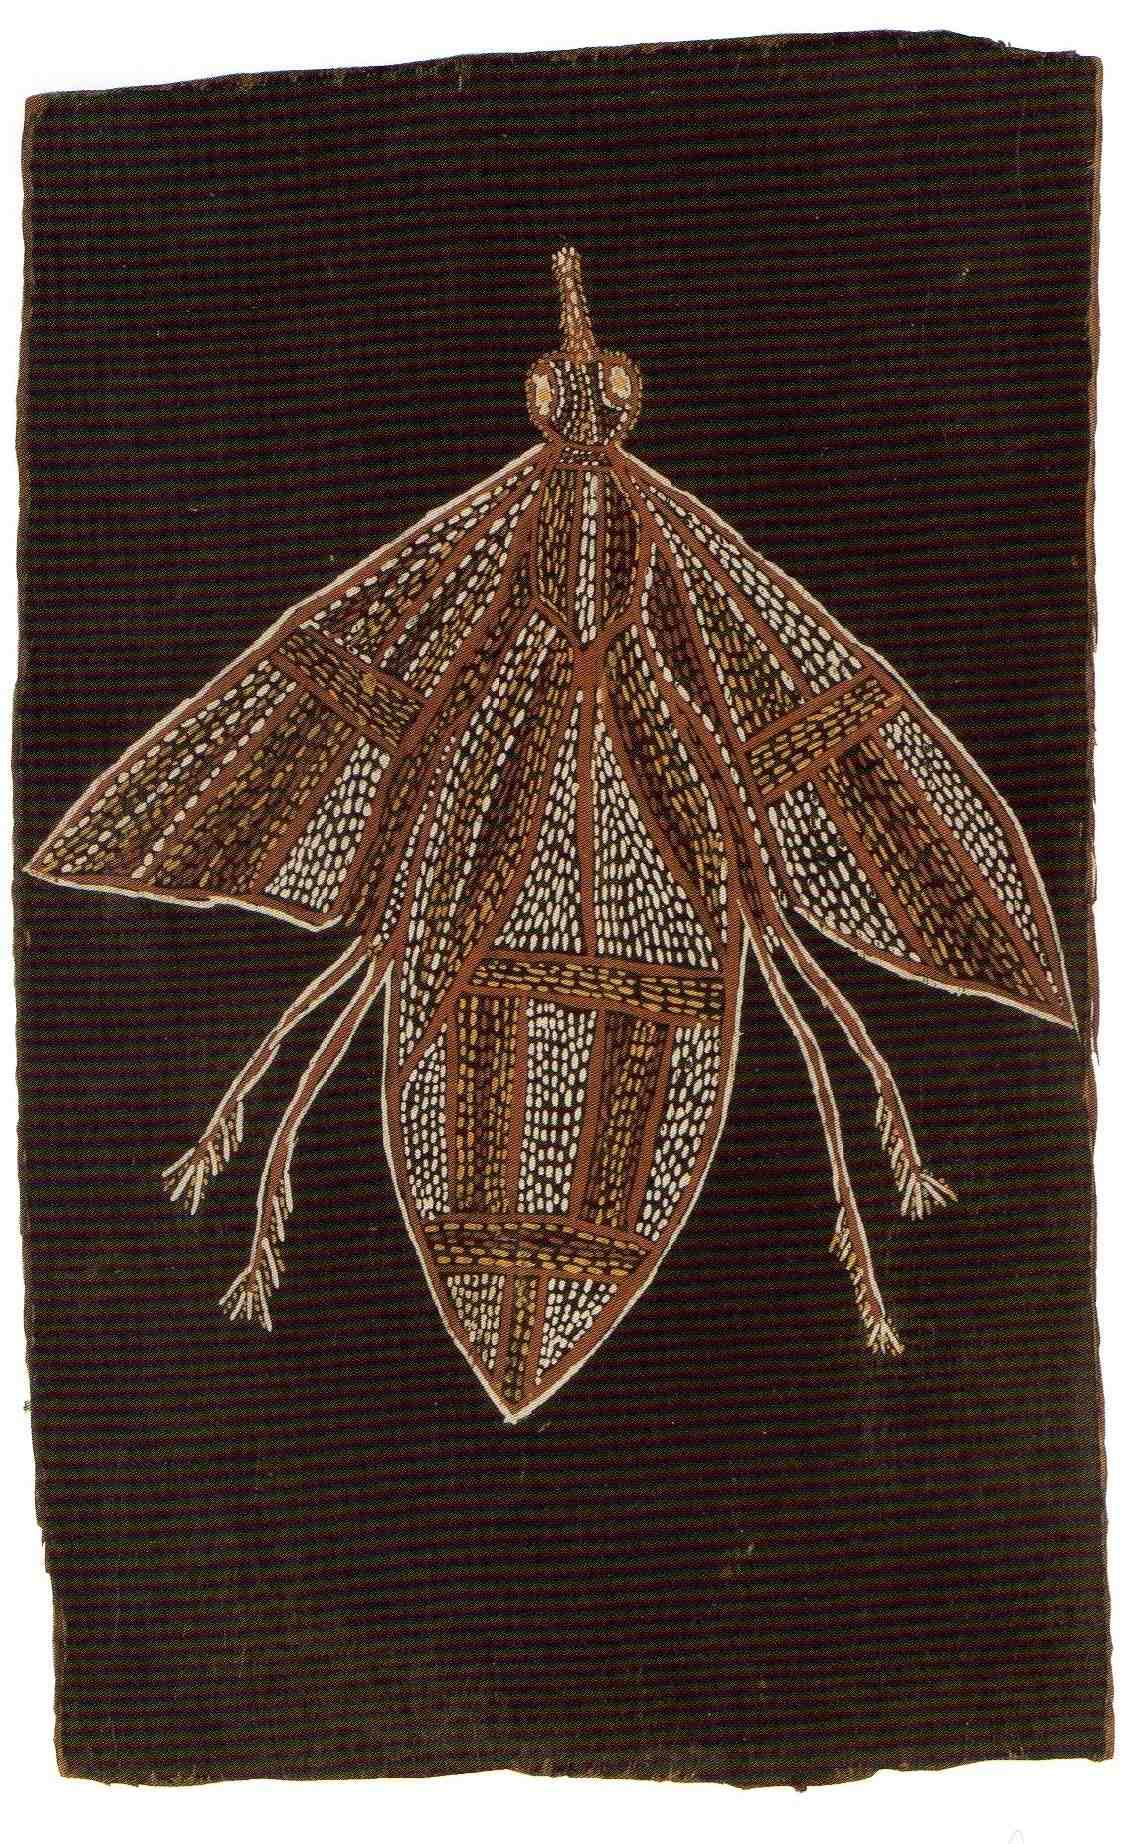 Armagoola Nanjiwara